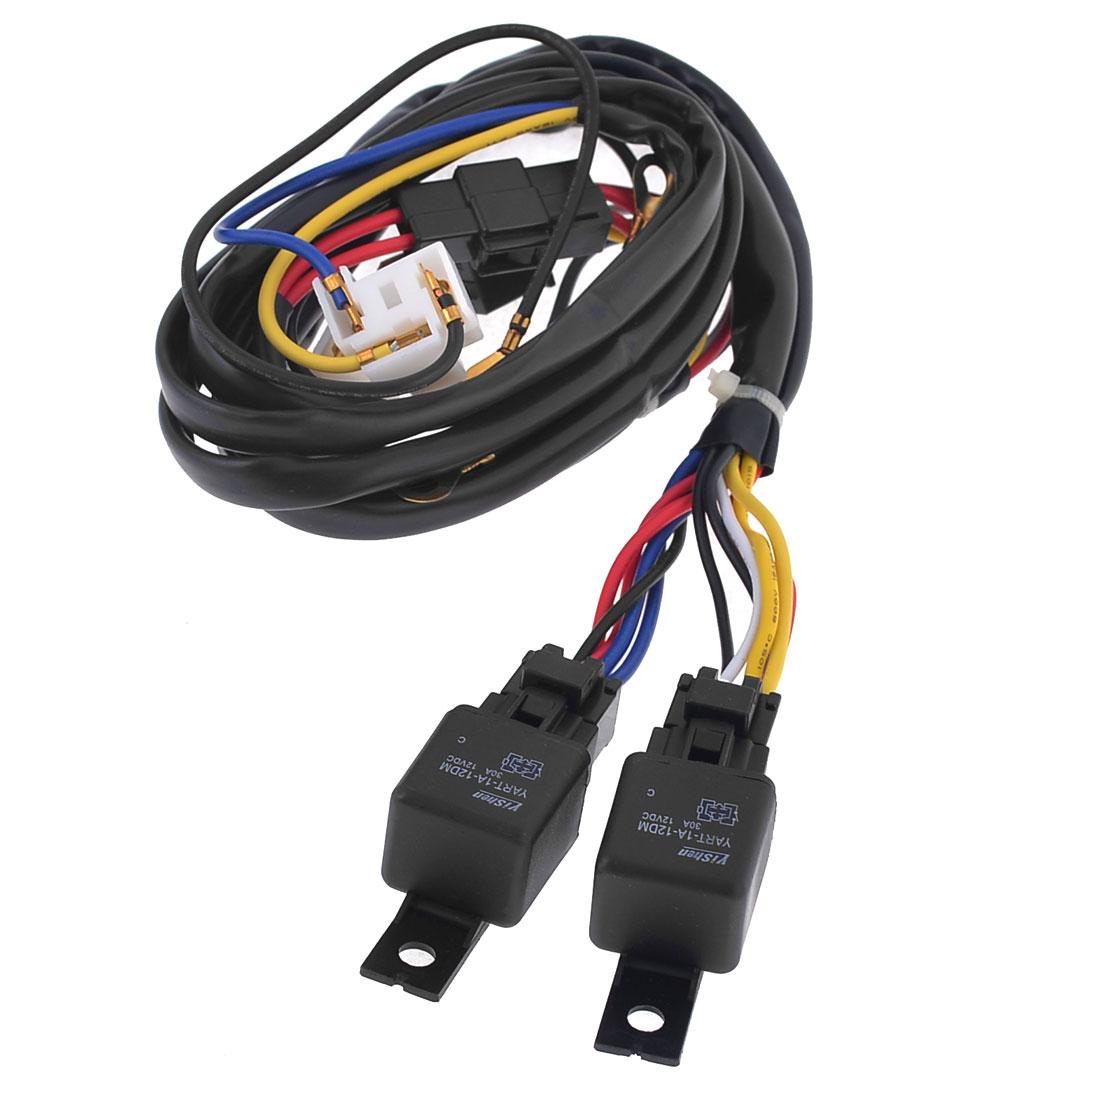 H4 Halogen Fog Lamp Light 100/90W Wiring Controller Kit